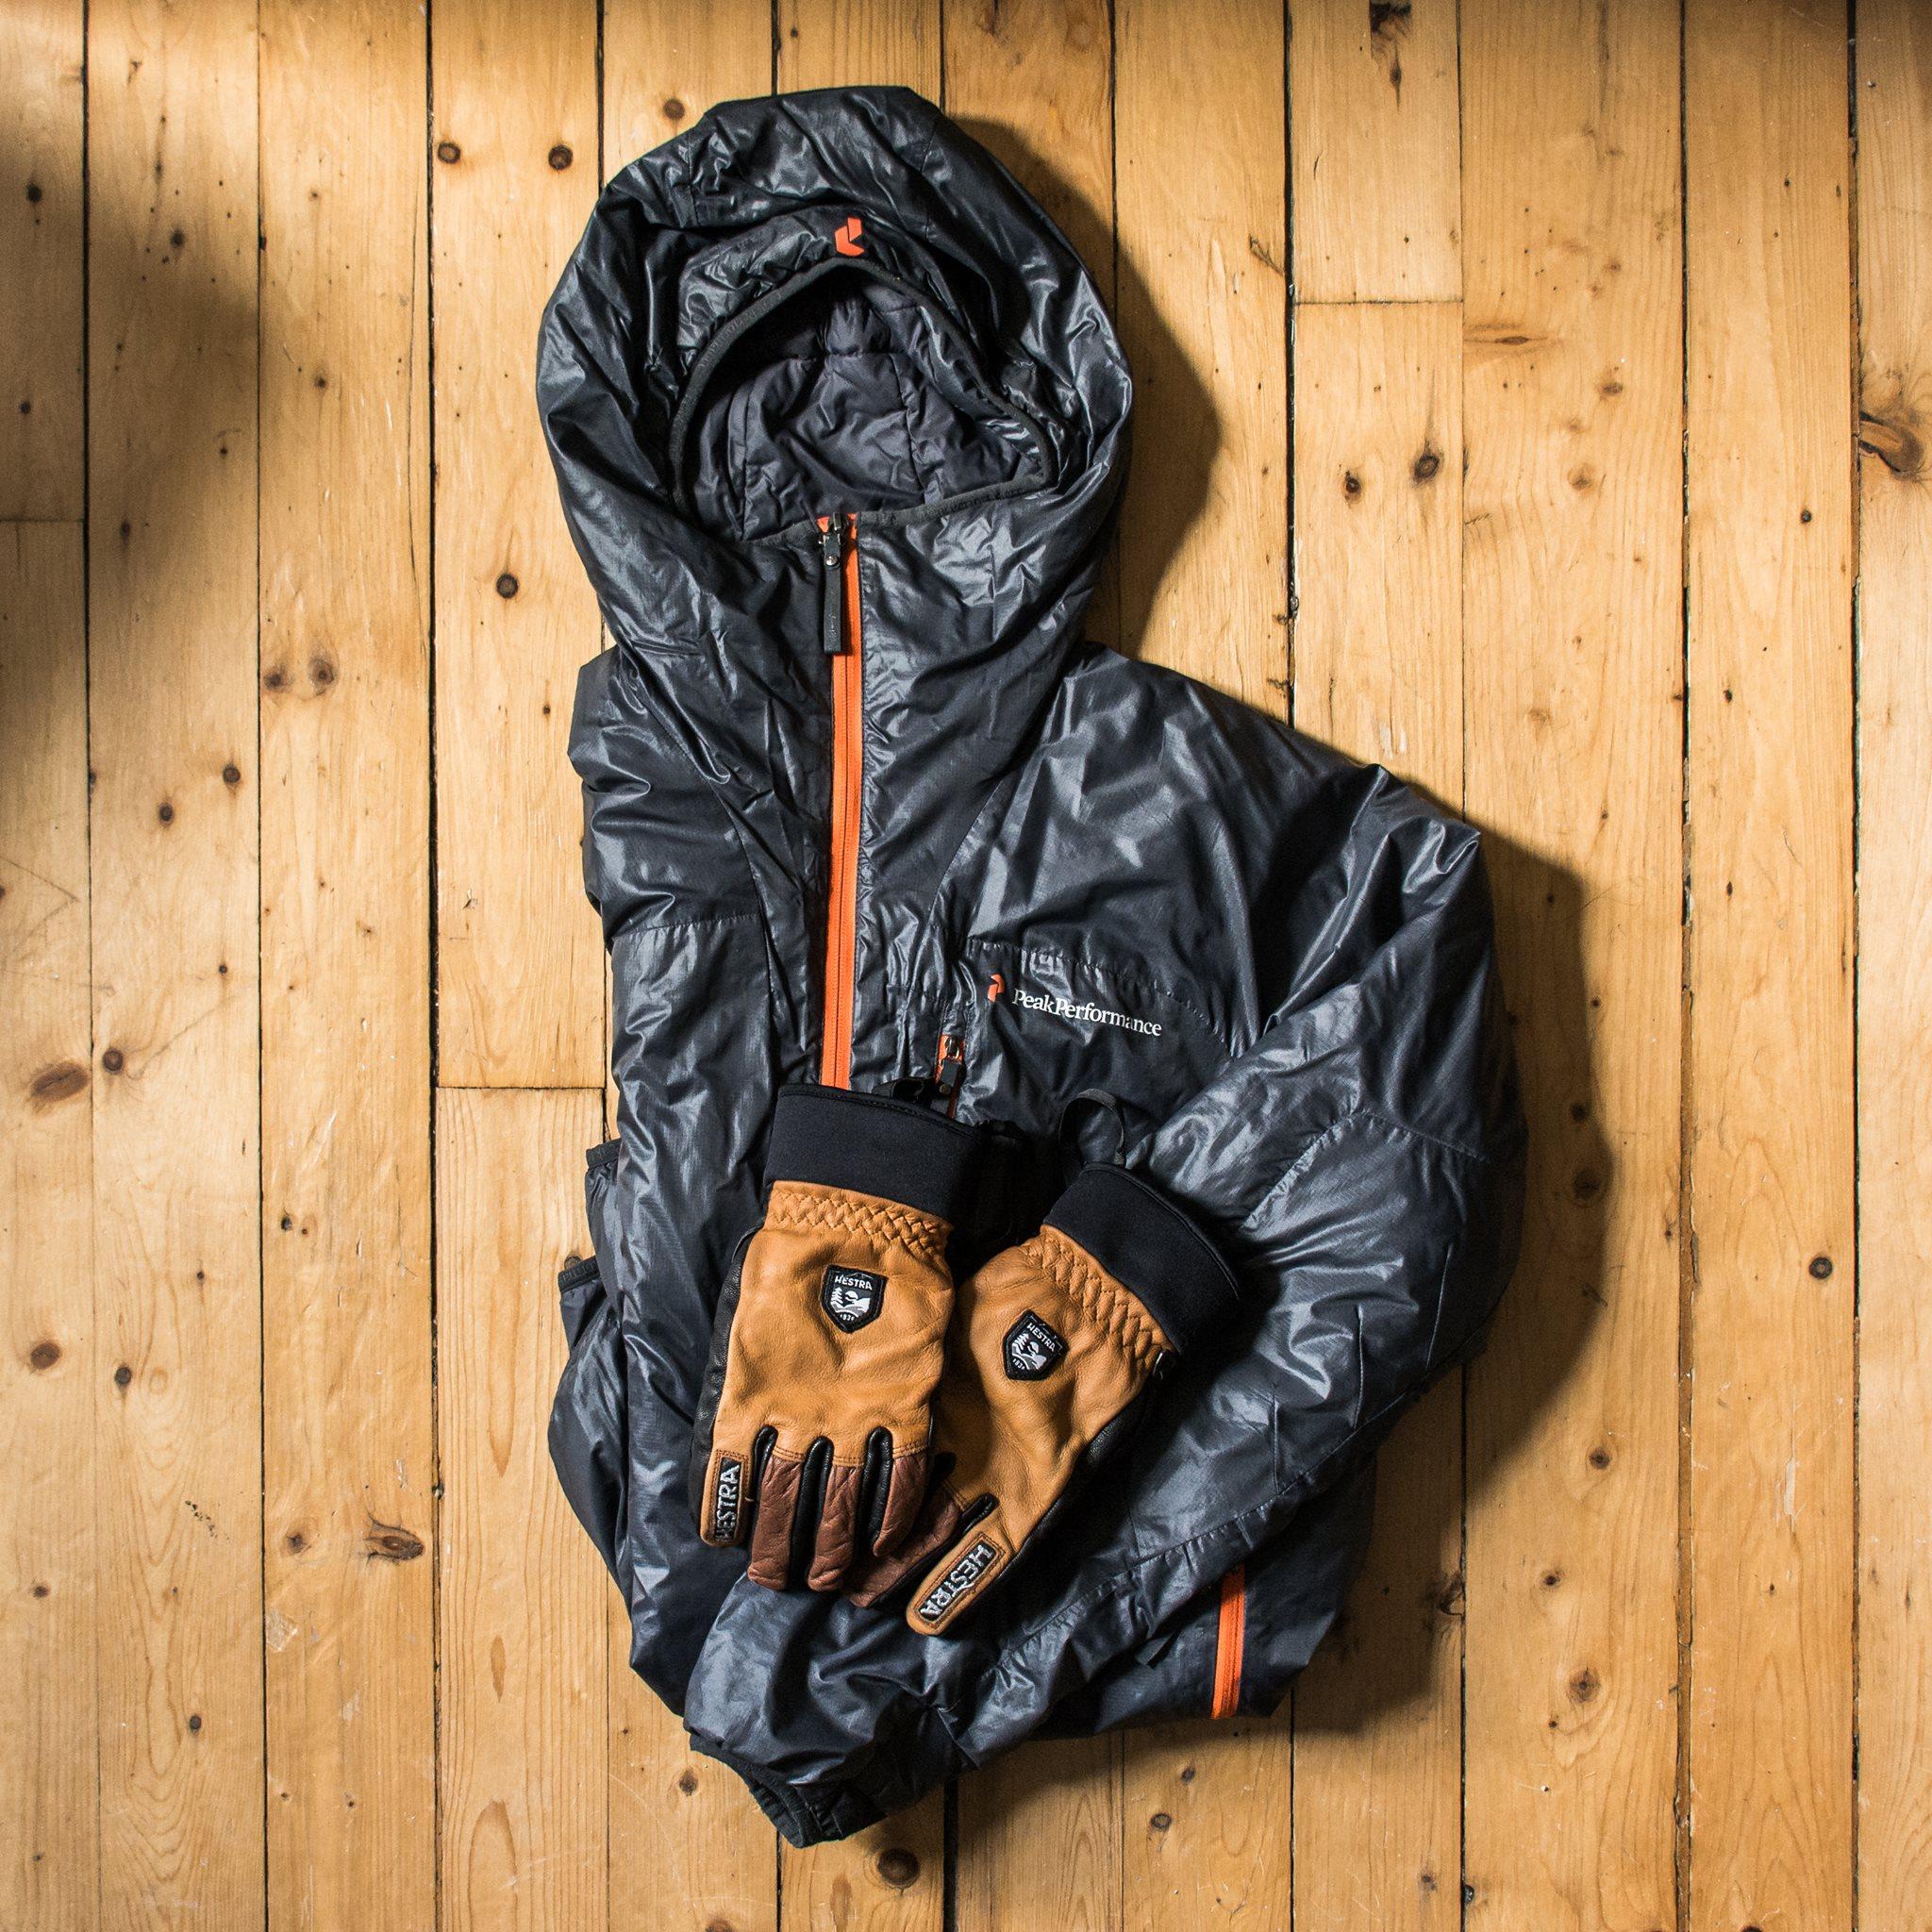 Doudoune et gants